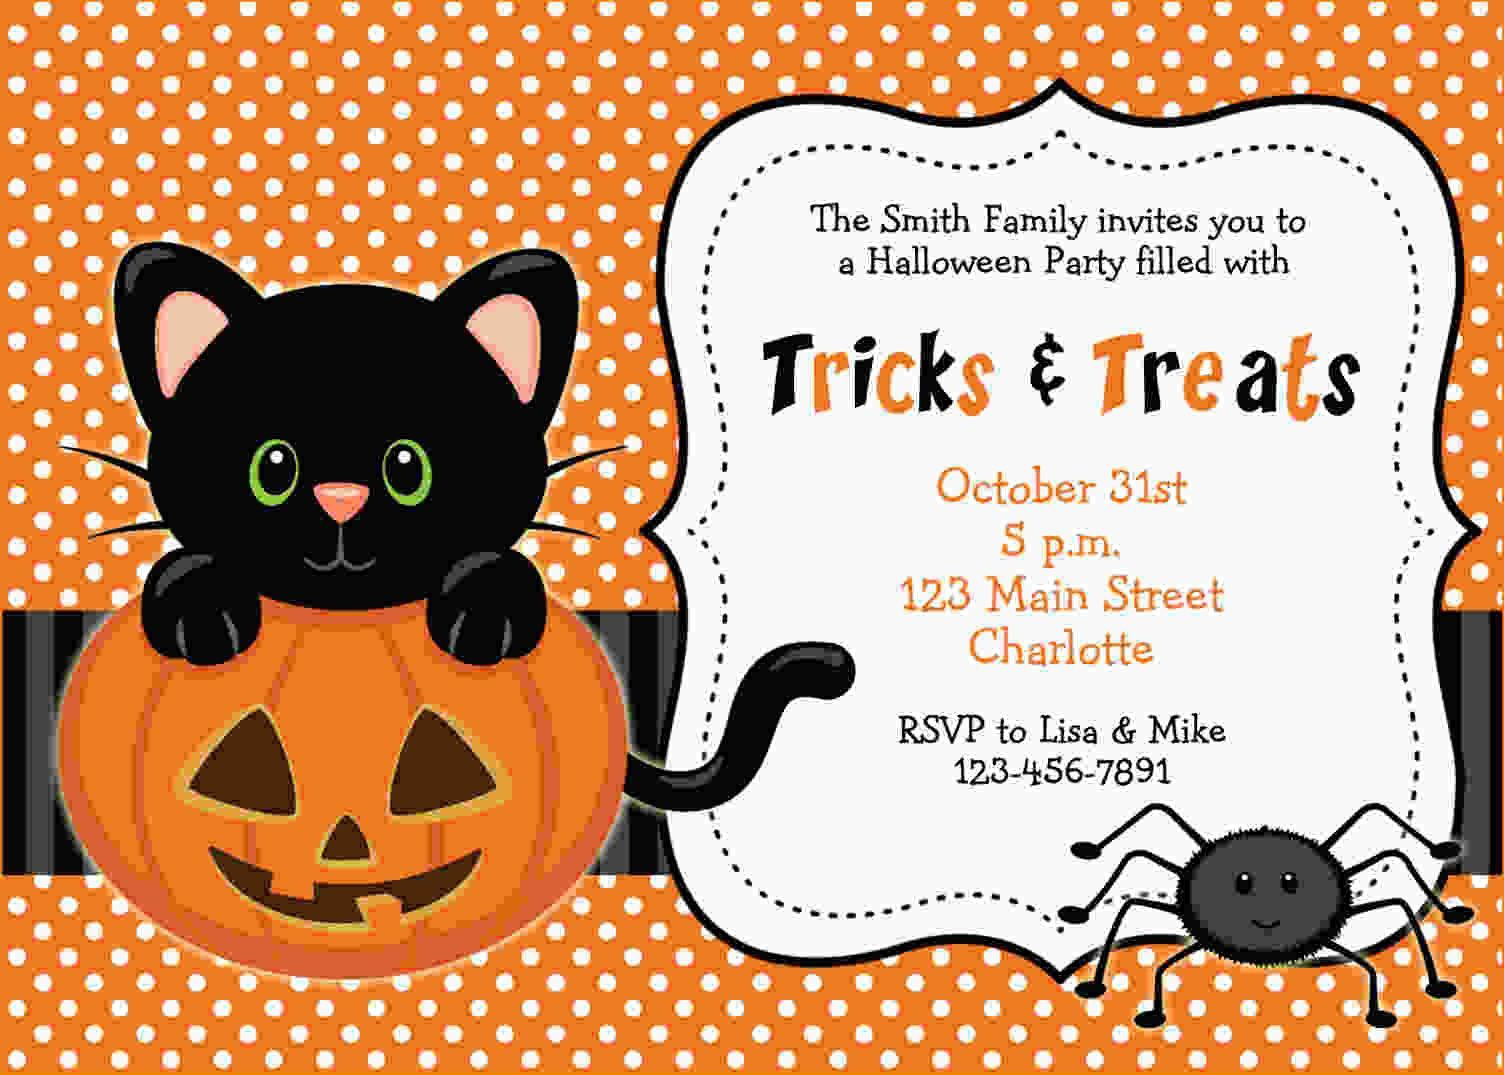 005 Sensational Halloween Party Invite Template Idea  Templates - Free Printable Spooky Invitation BirthdayFull